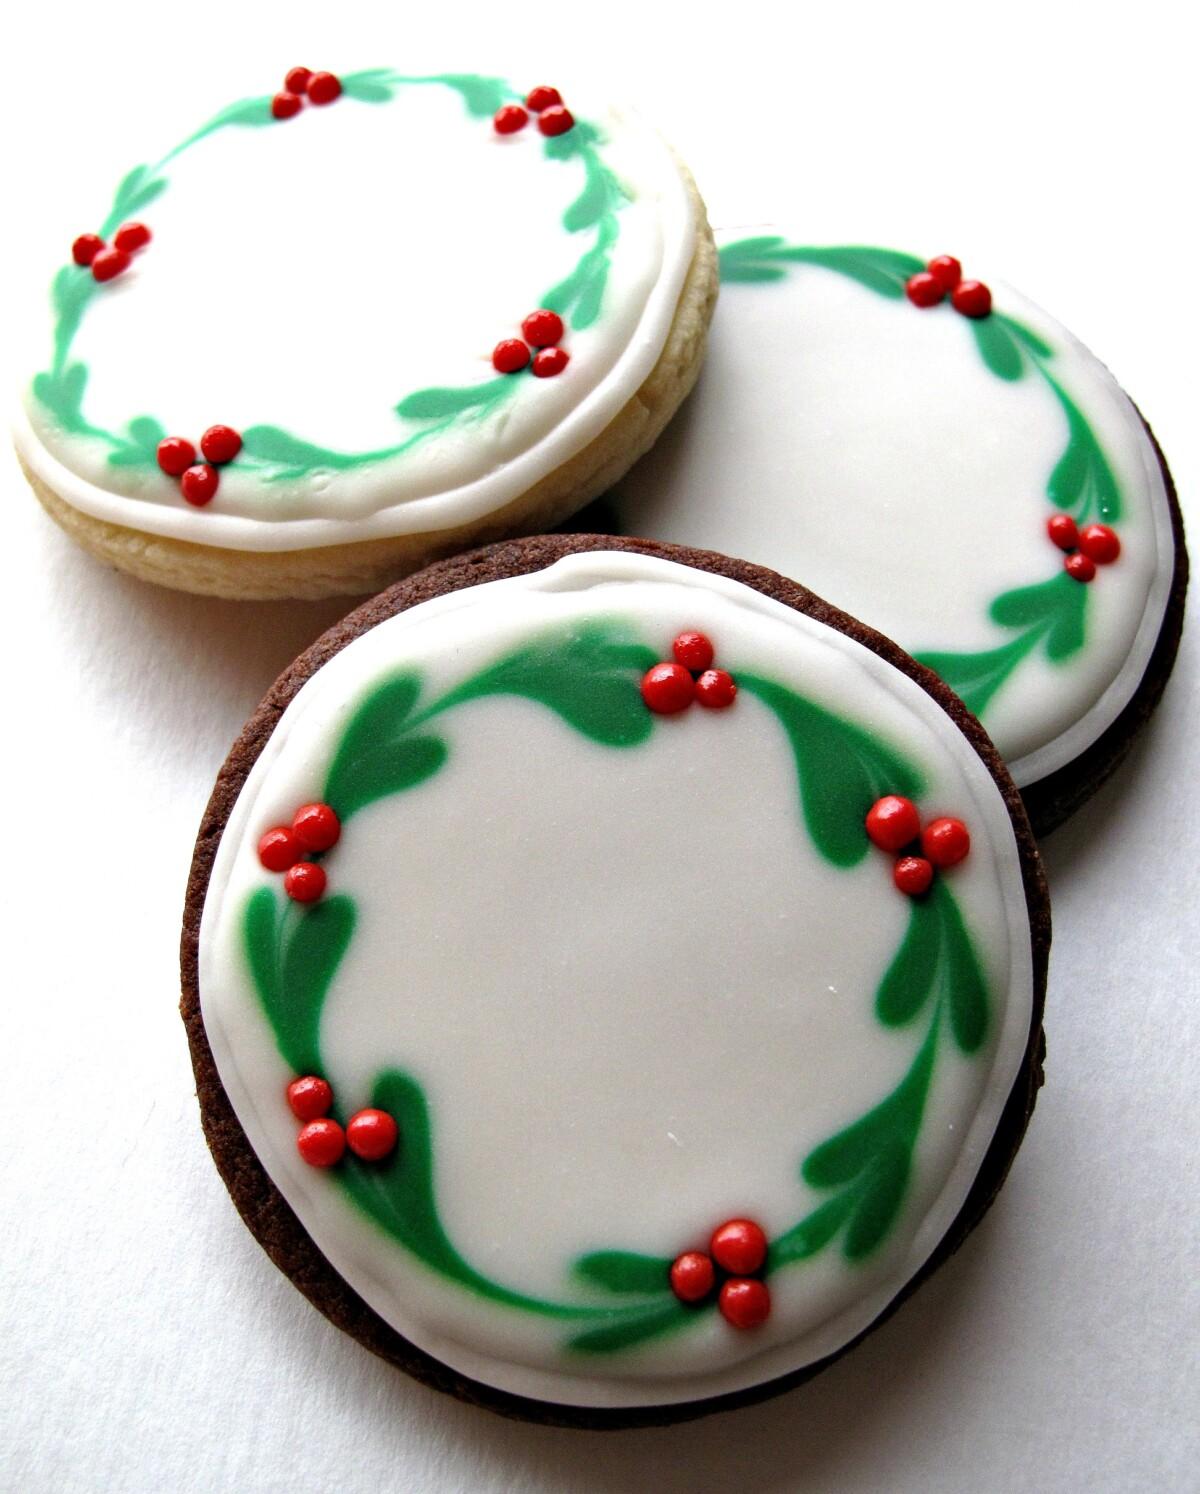 Iced Christmas Sugar Cookies with Christmas wreath designs.